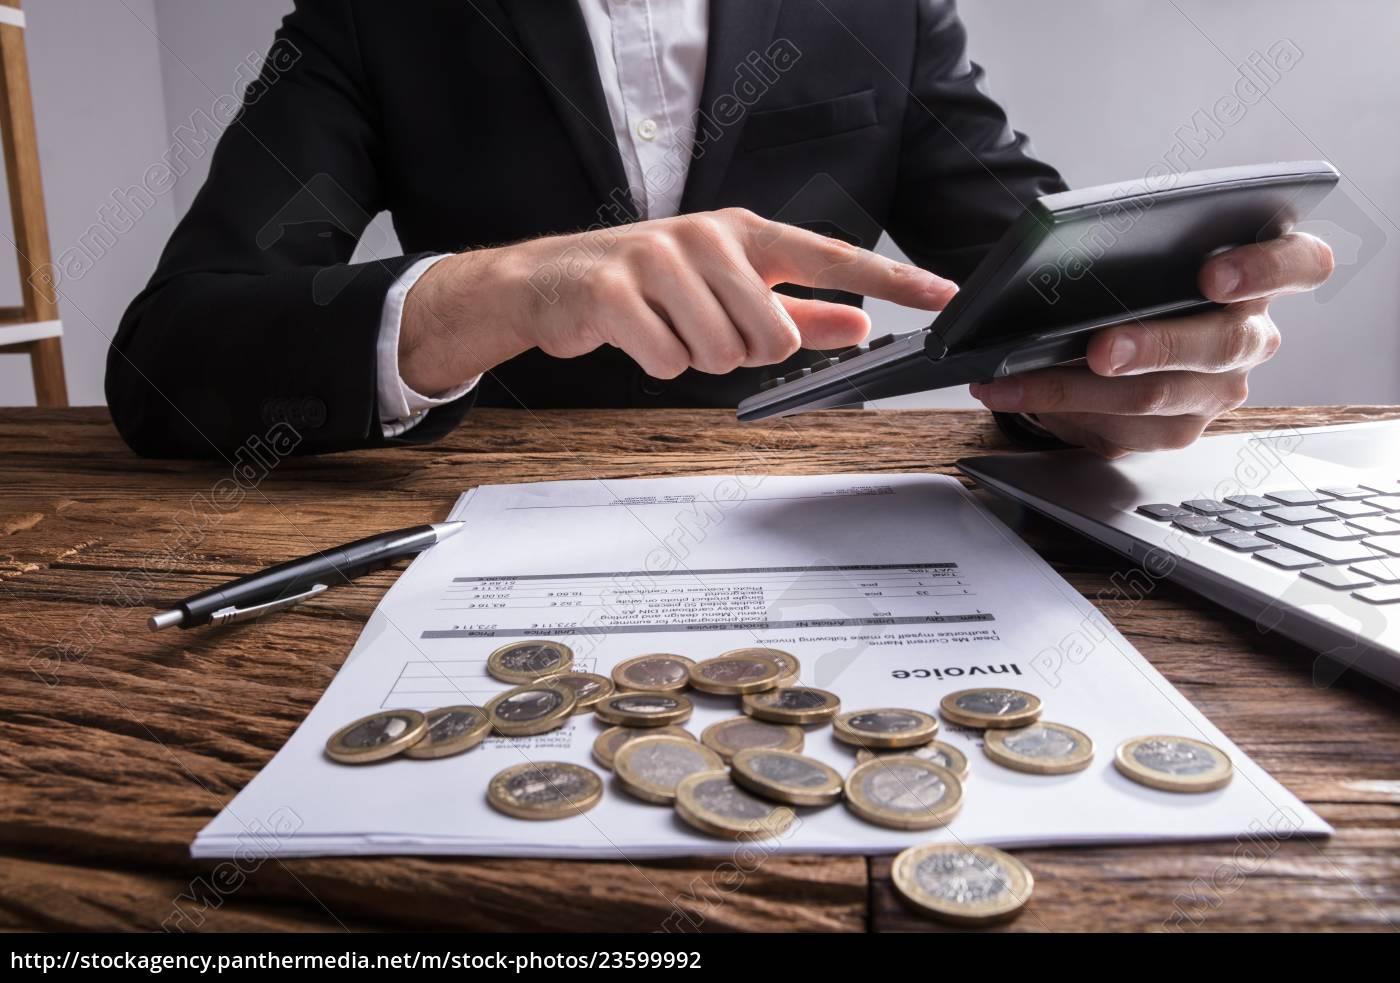 businessperson's, hand, analyzing, bill, with, calculator - 23599992